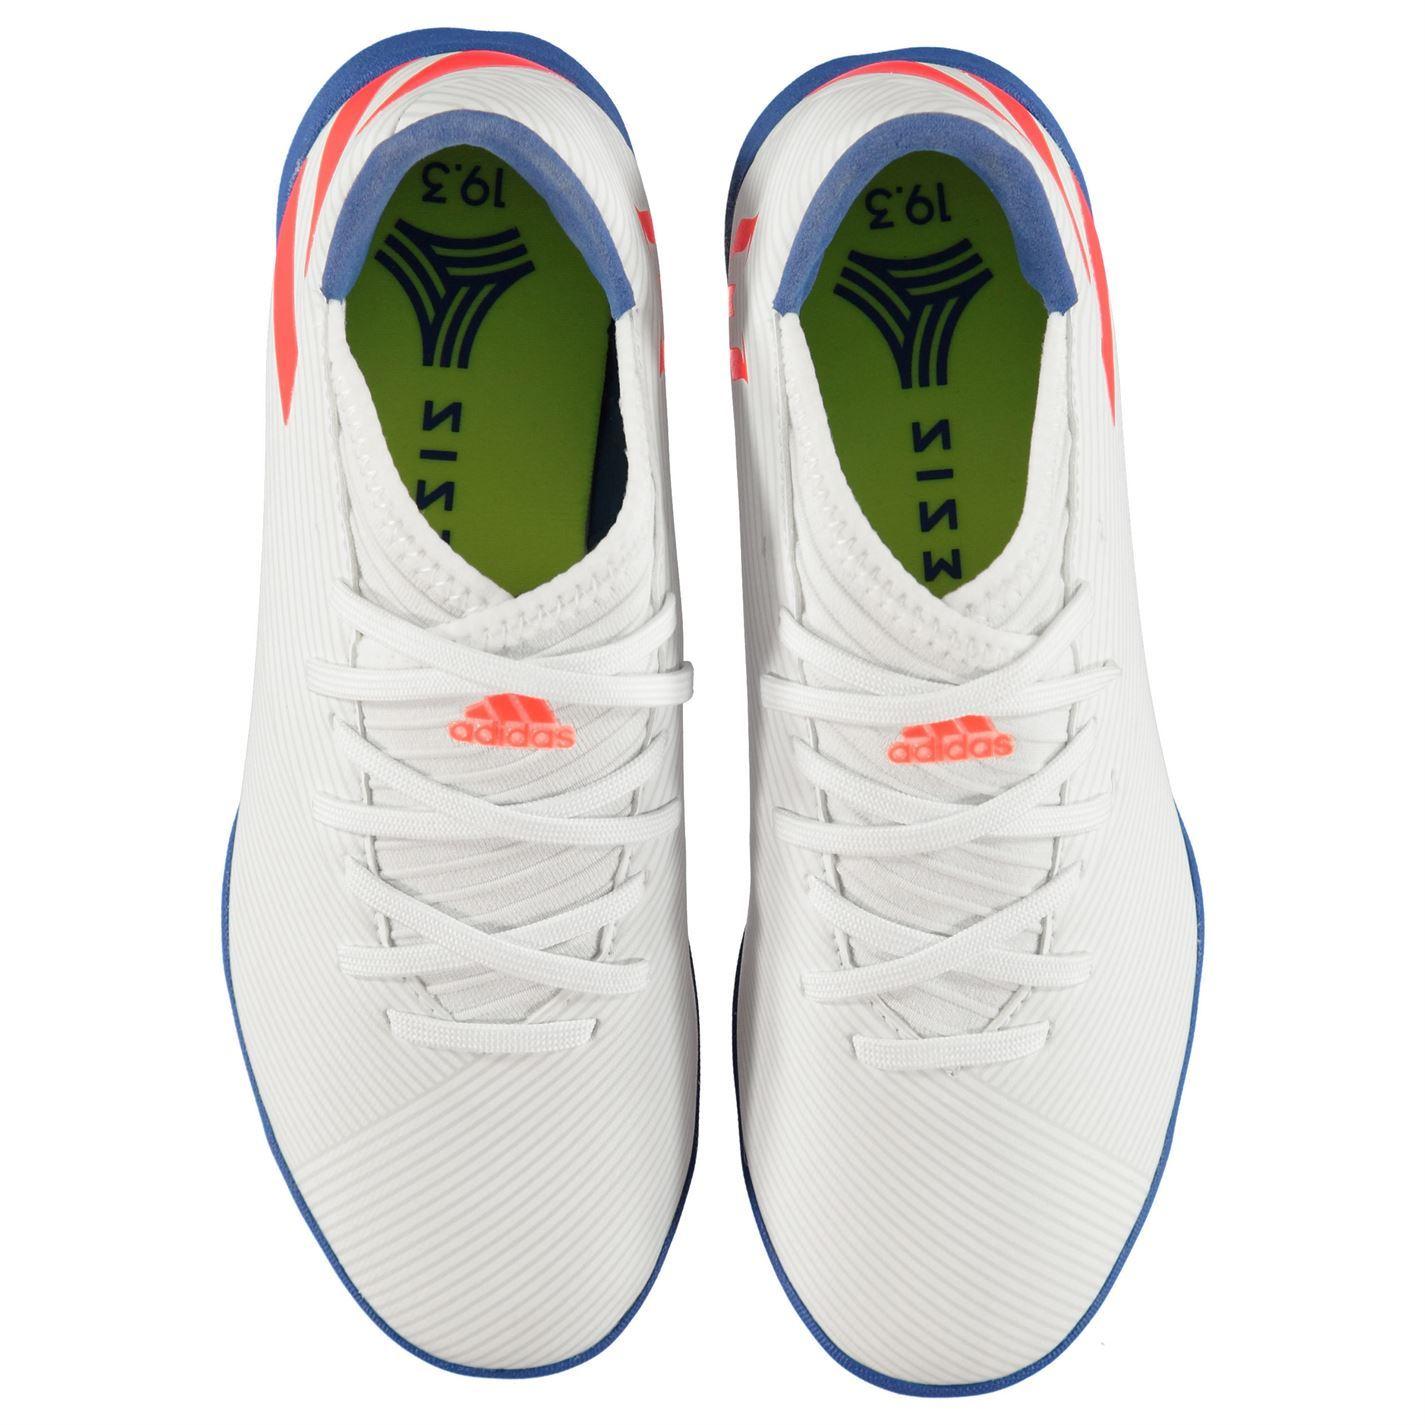 Details about adidas Nemeziz Messi 19.3 Astro Turf Football Shoes Juniors White Soccer Trainer